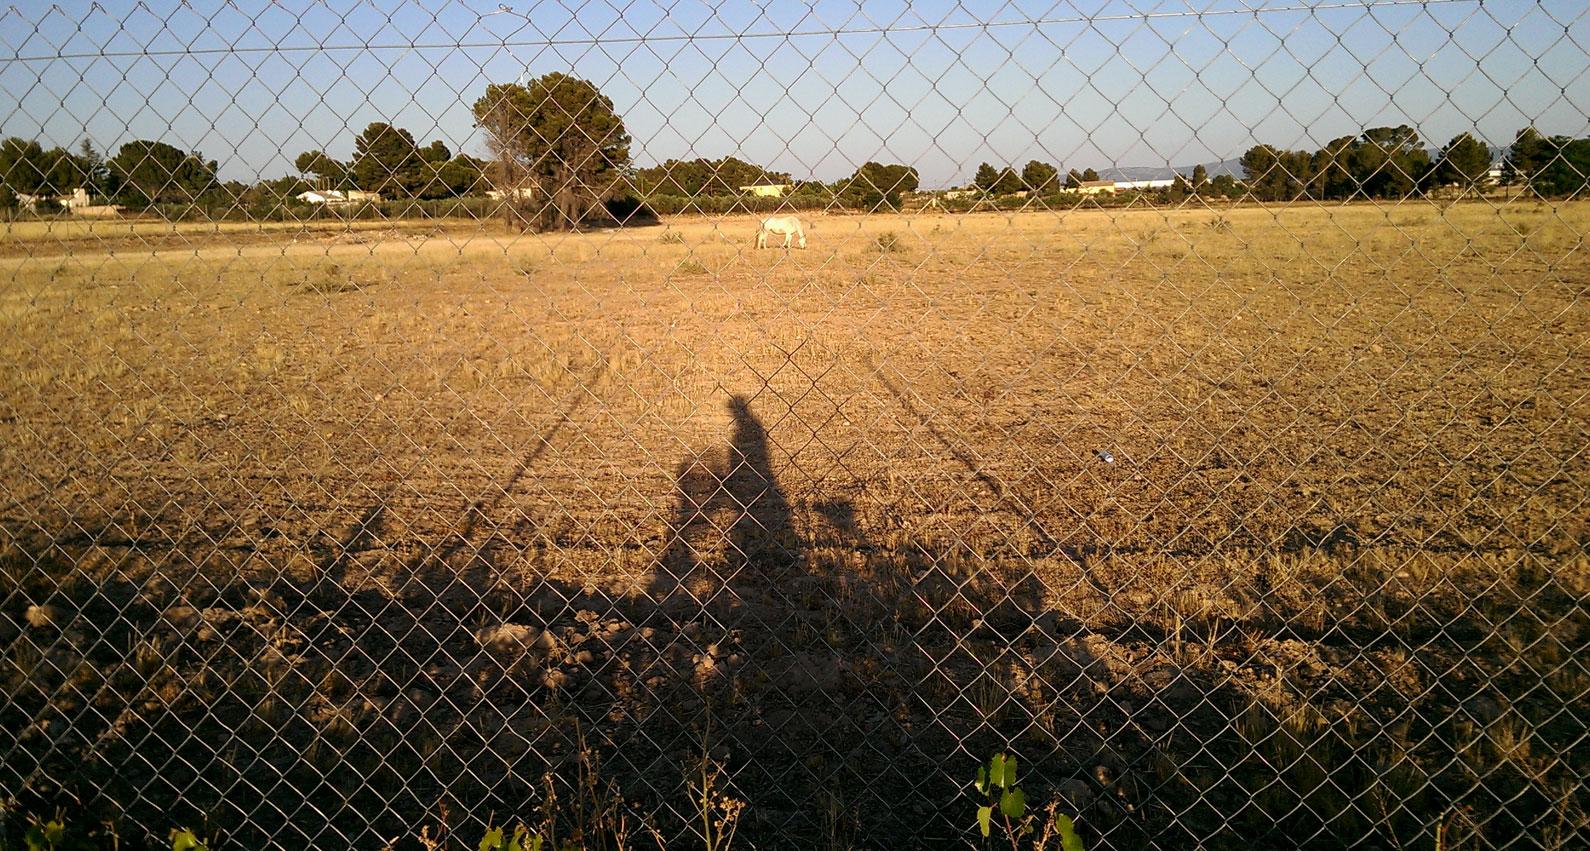 Yecla, Senda de los Jinetes, julio 2016